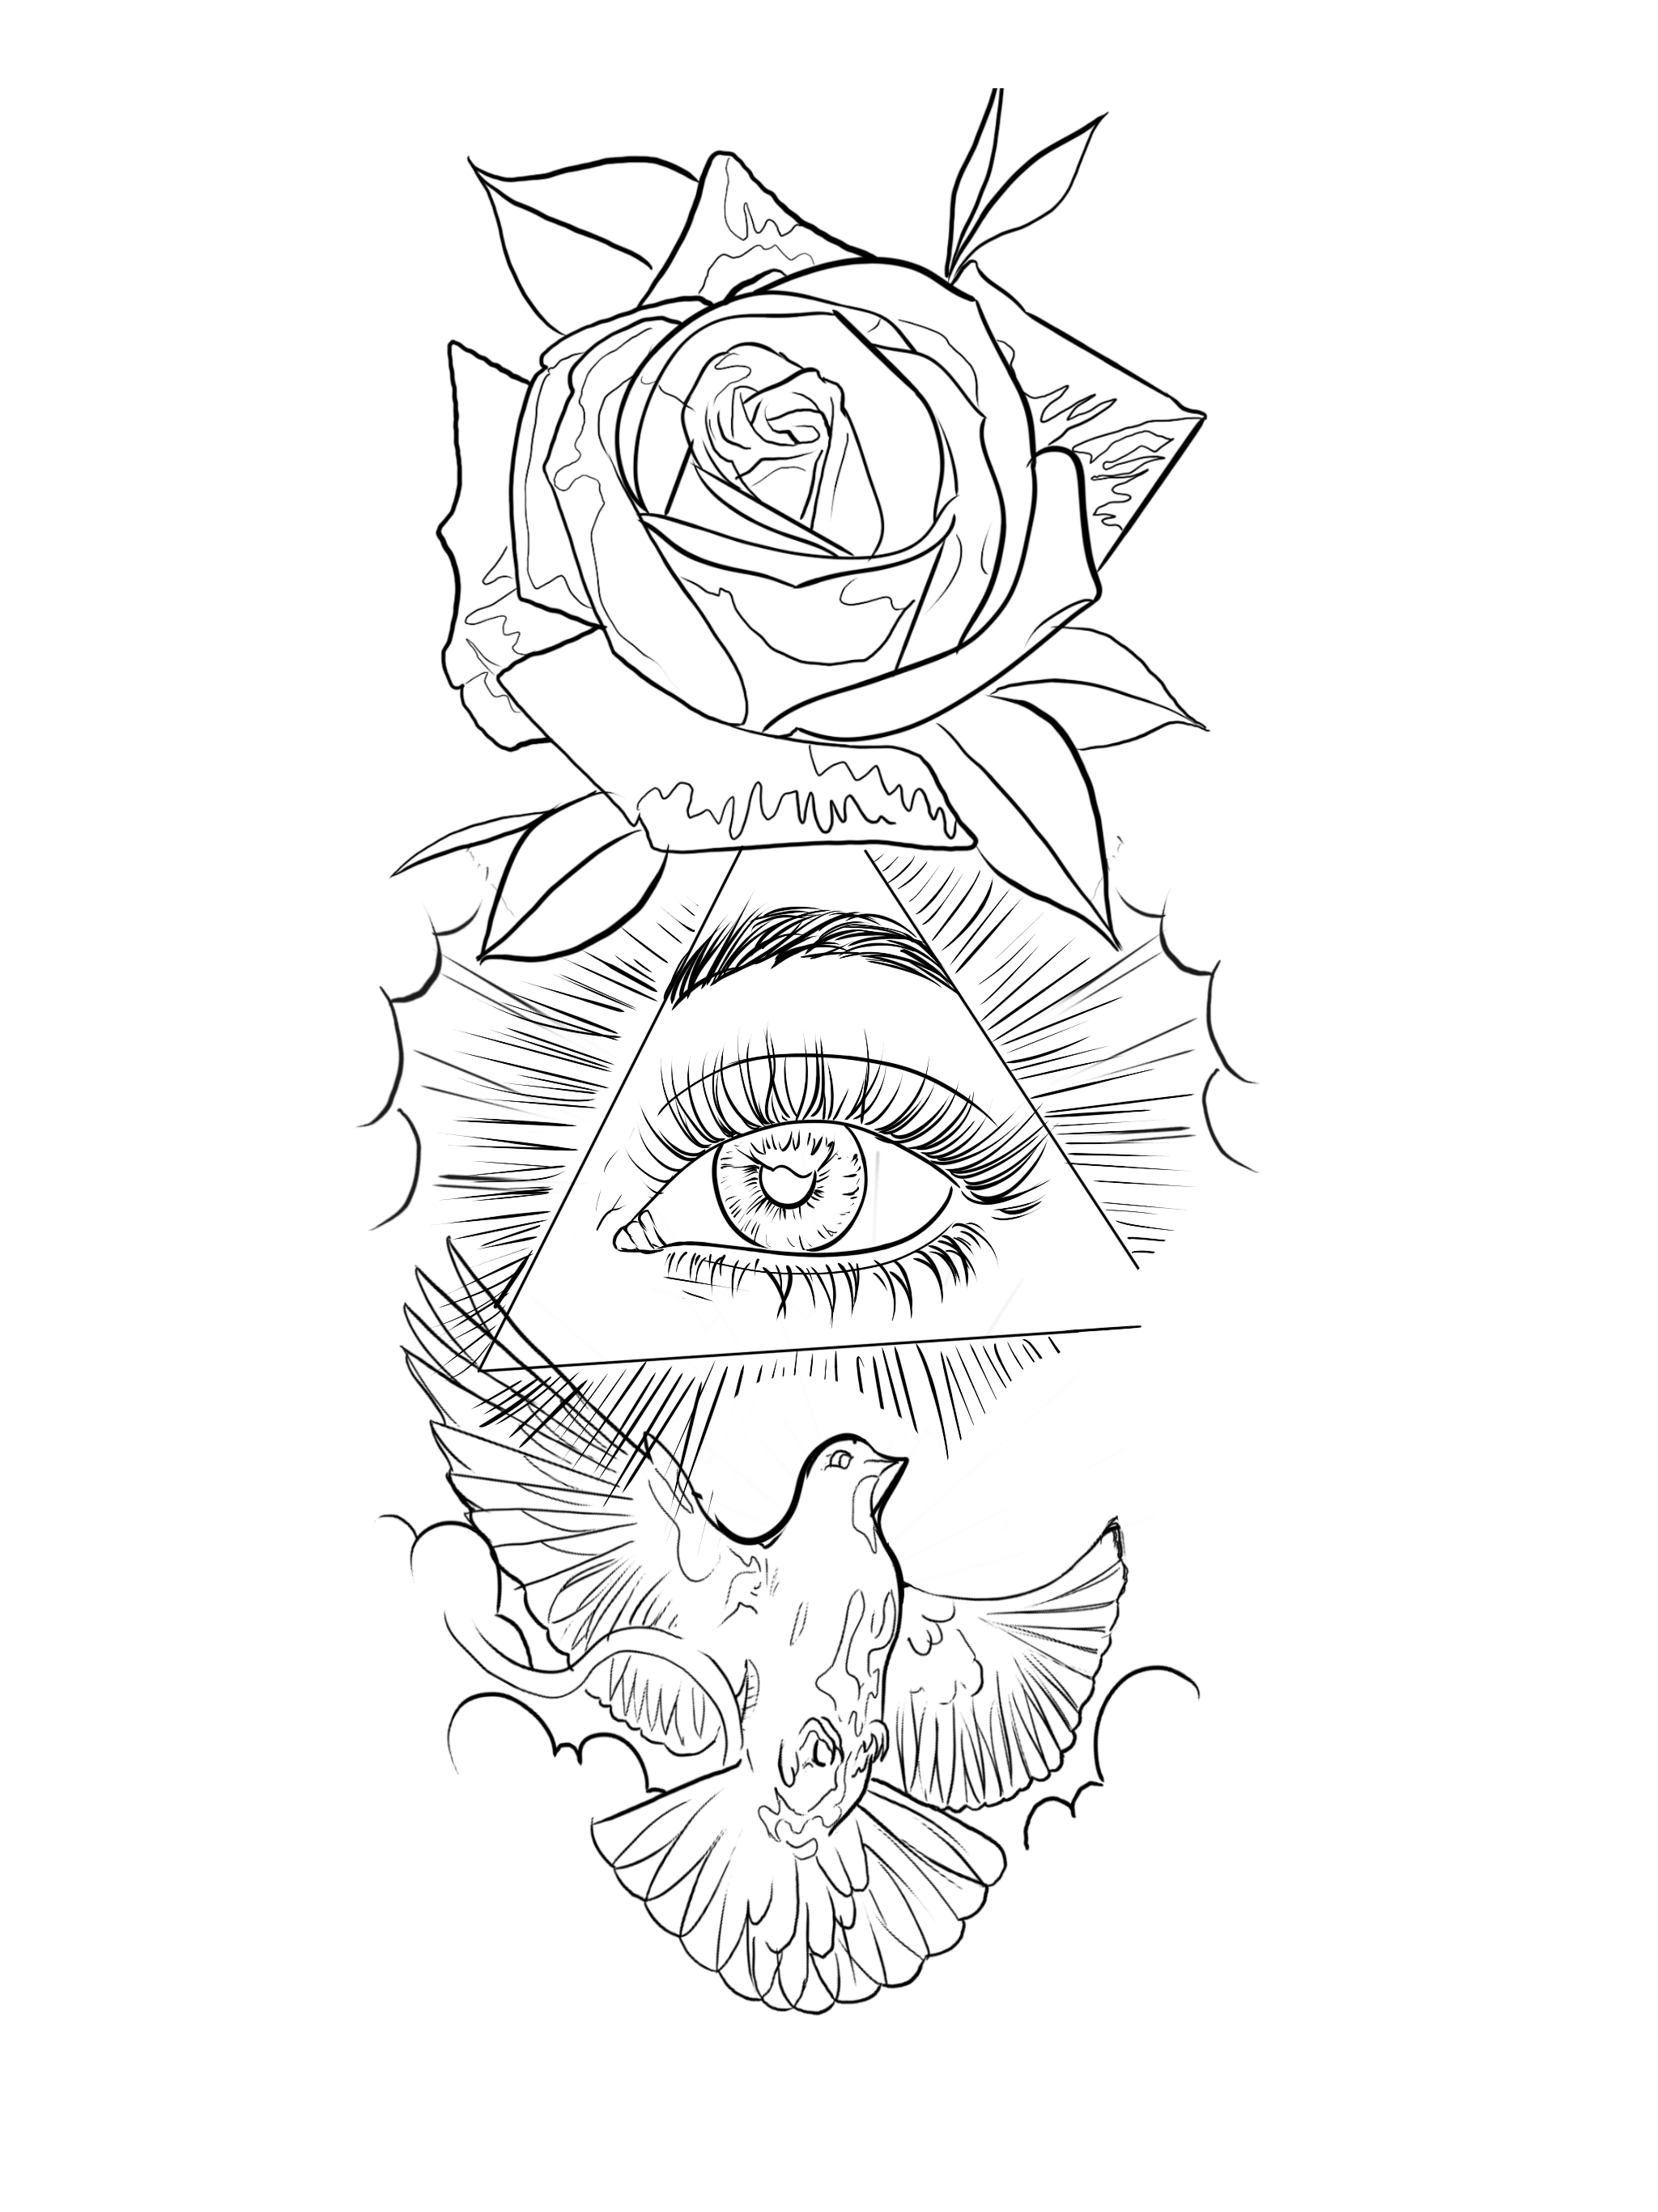 Celtic Half Sleeve Tattoo Designs Drawings Google Search Also Repin Uamp Like Please Sle Tattoo Design Drawings Half Sleeve Tattoos Designs Half Sleeve Tattoo